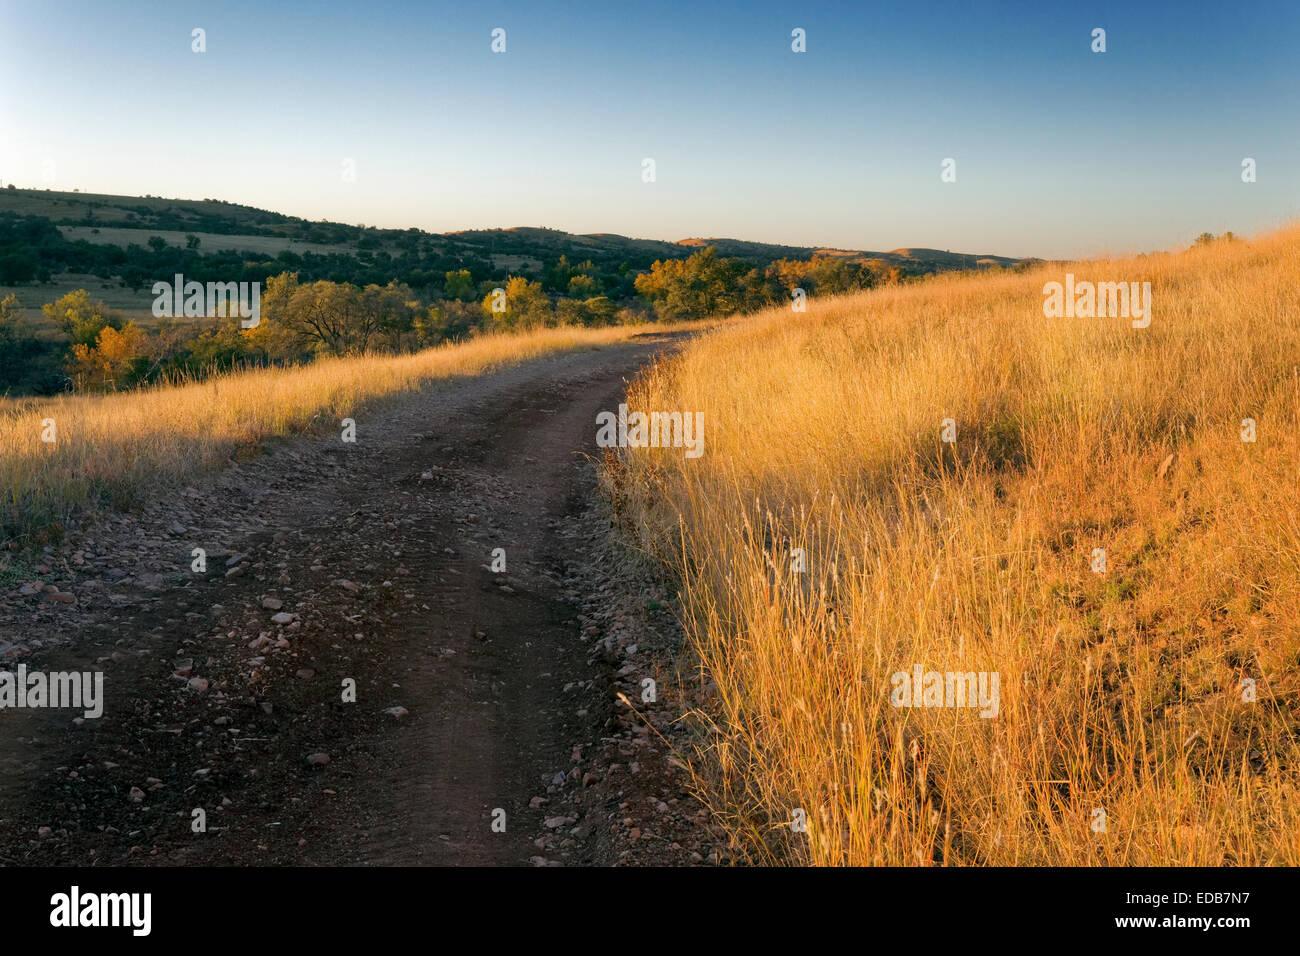 Country Road, Santa Cruz County, Arizona - Stock Image